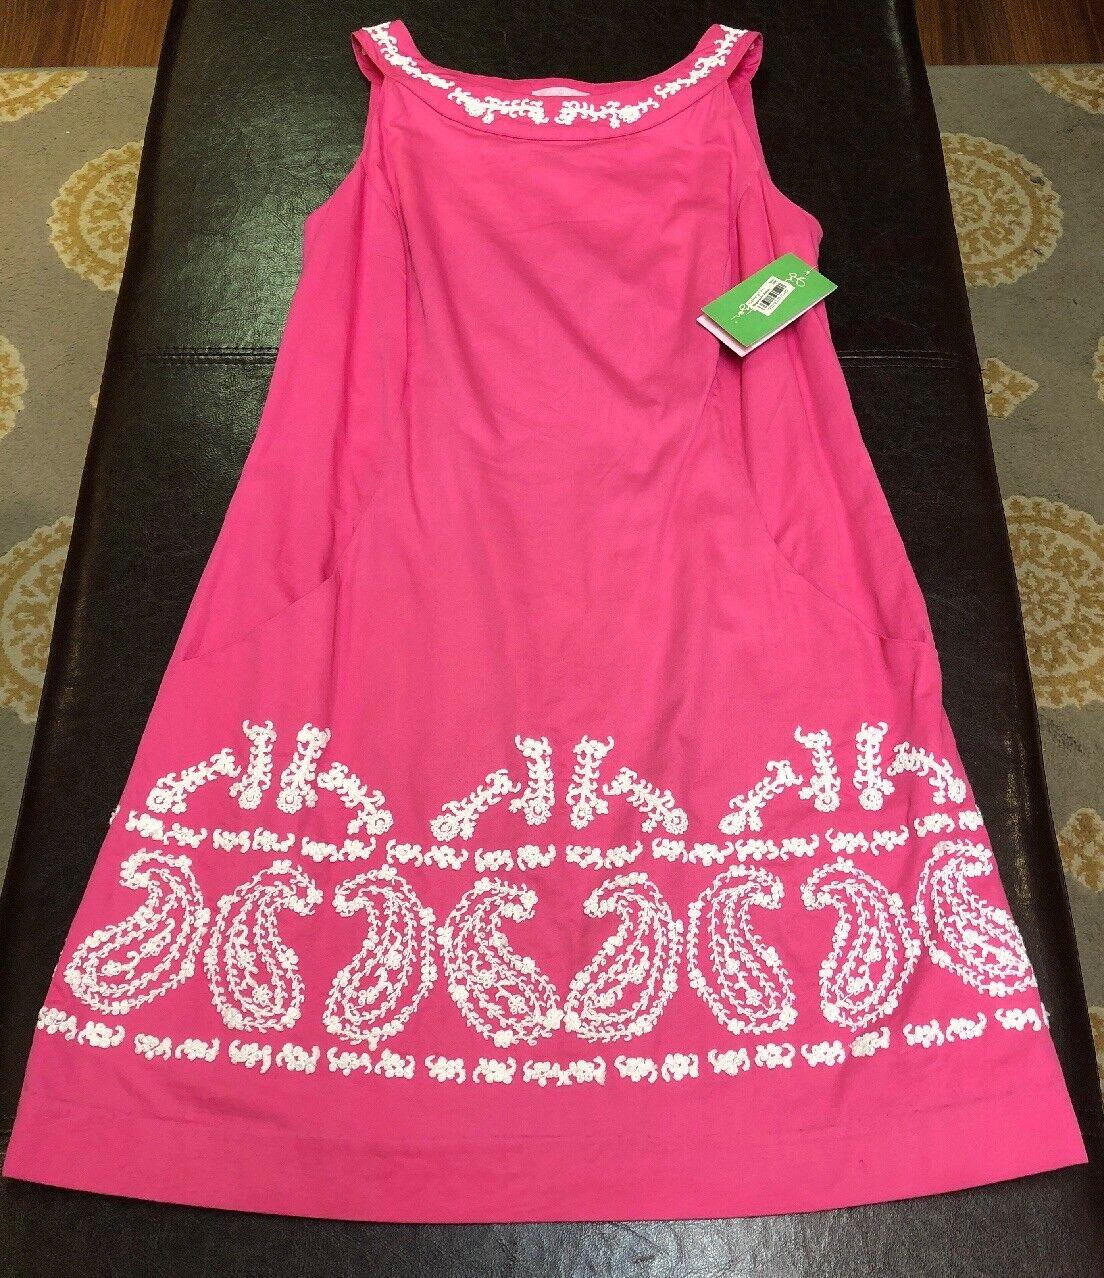 Lily pulitzer dress Größe 4